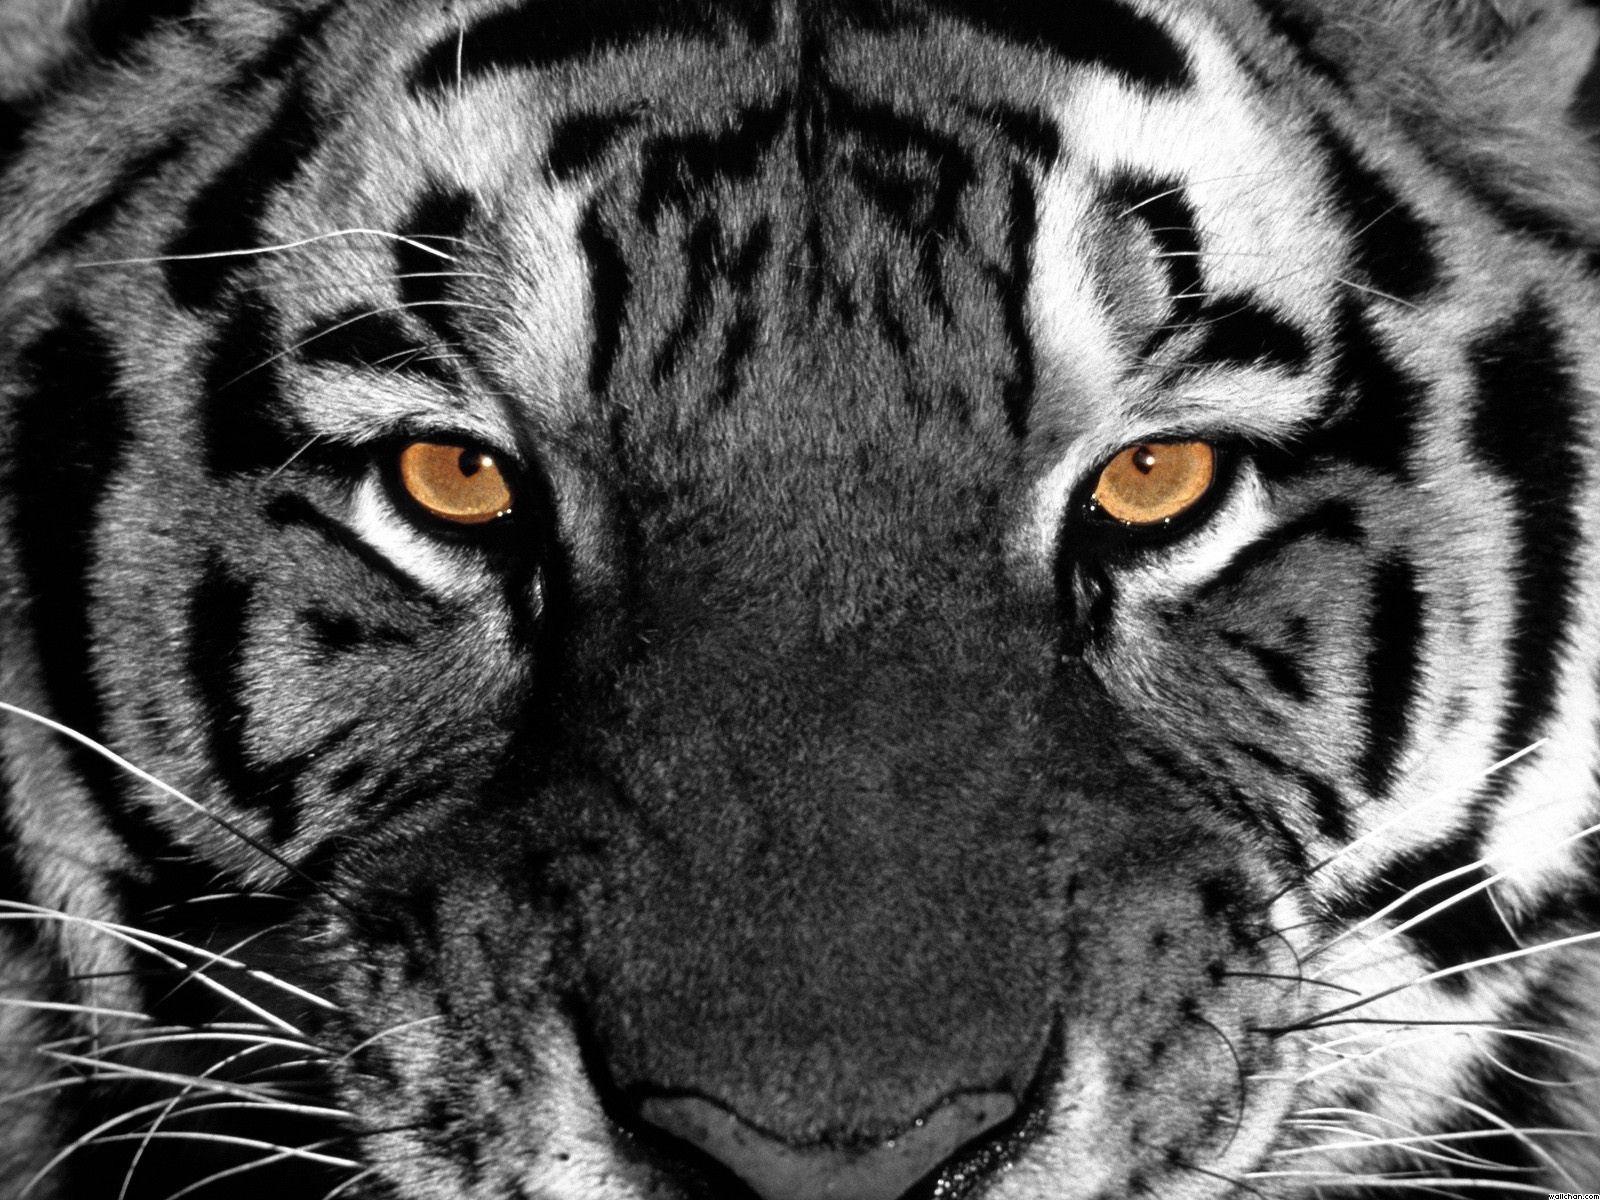 tiger hd wallpapers wallpaper 1600x1200